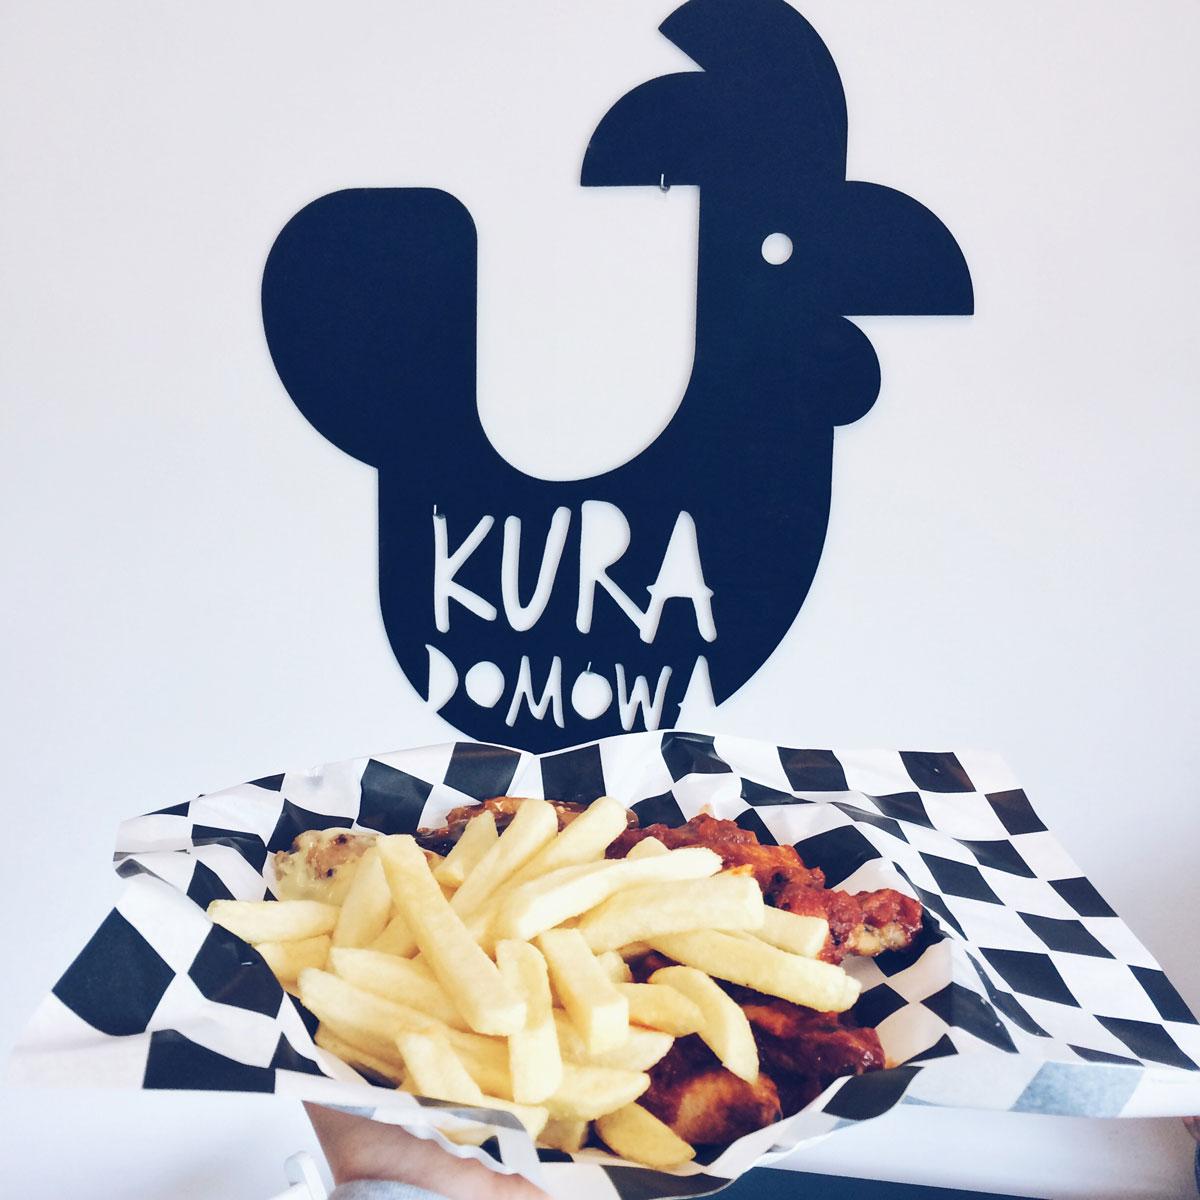 Kura Domowa skrzydełka z frytkami na tle logo